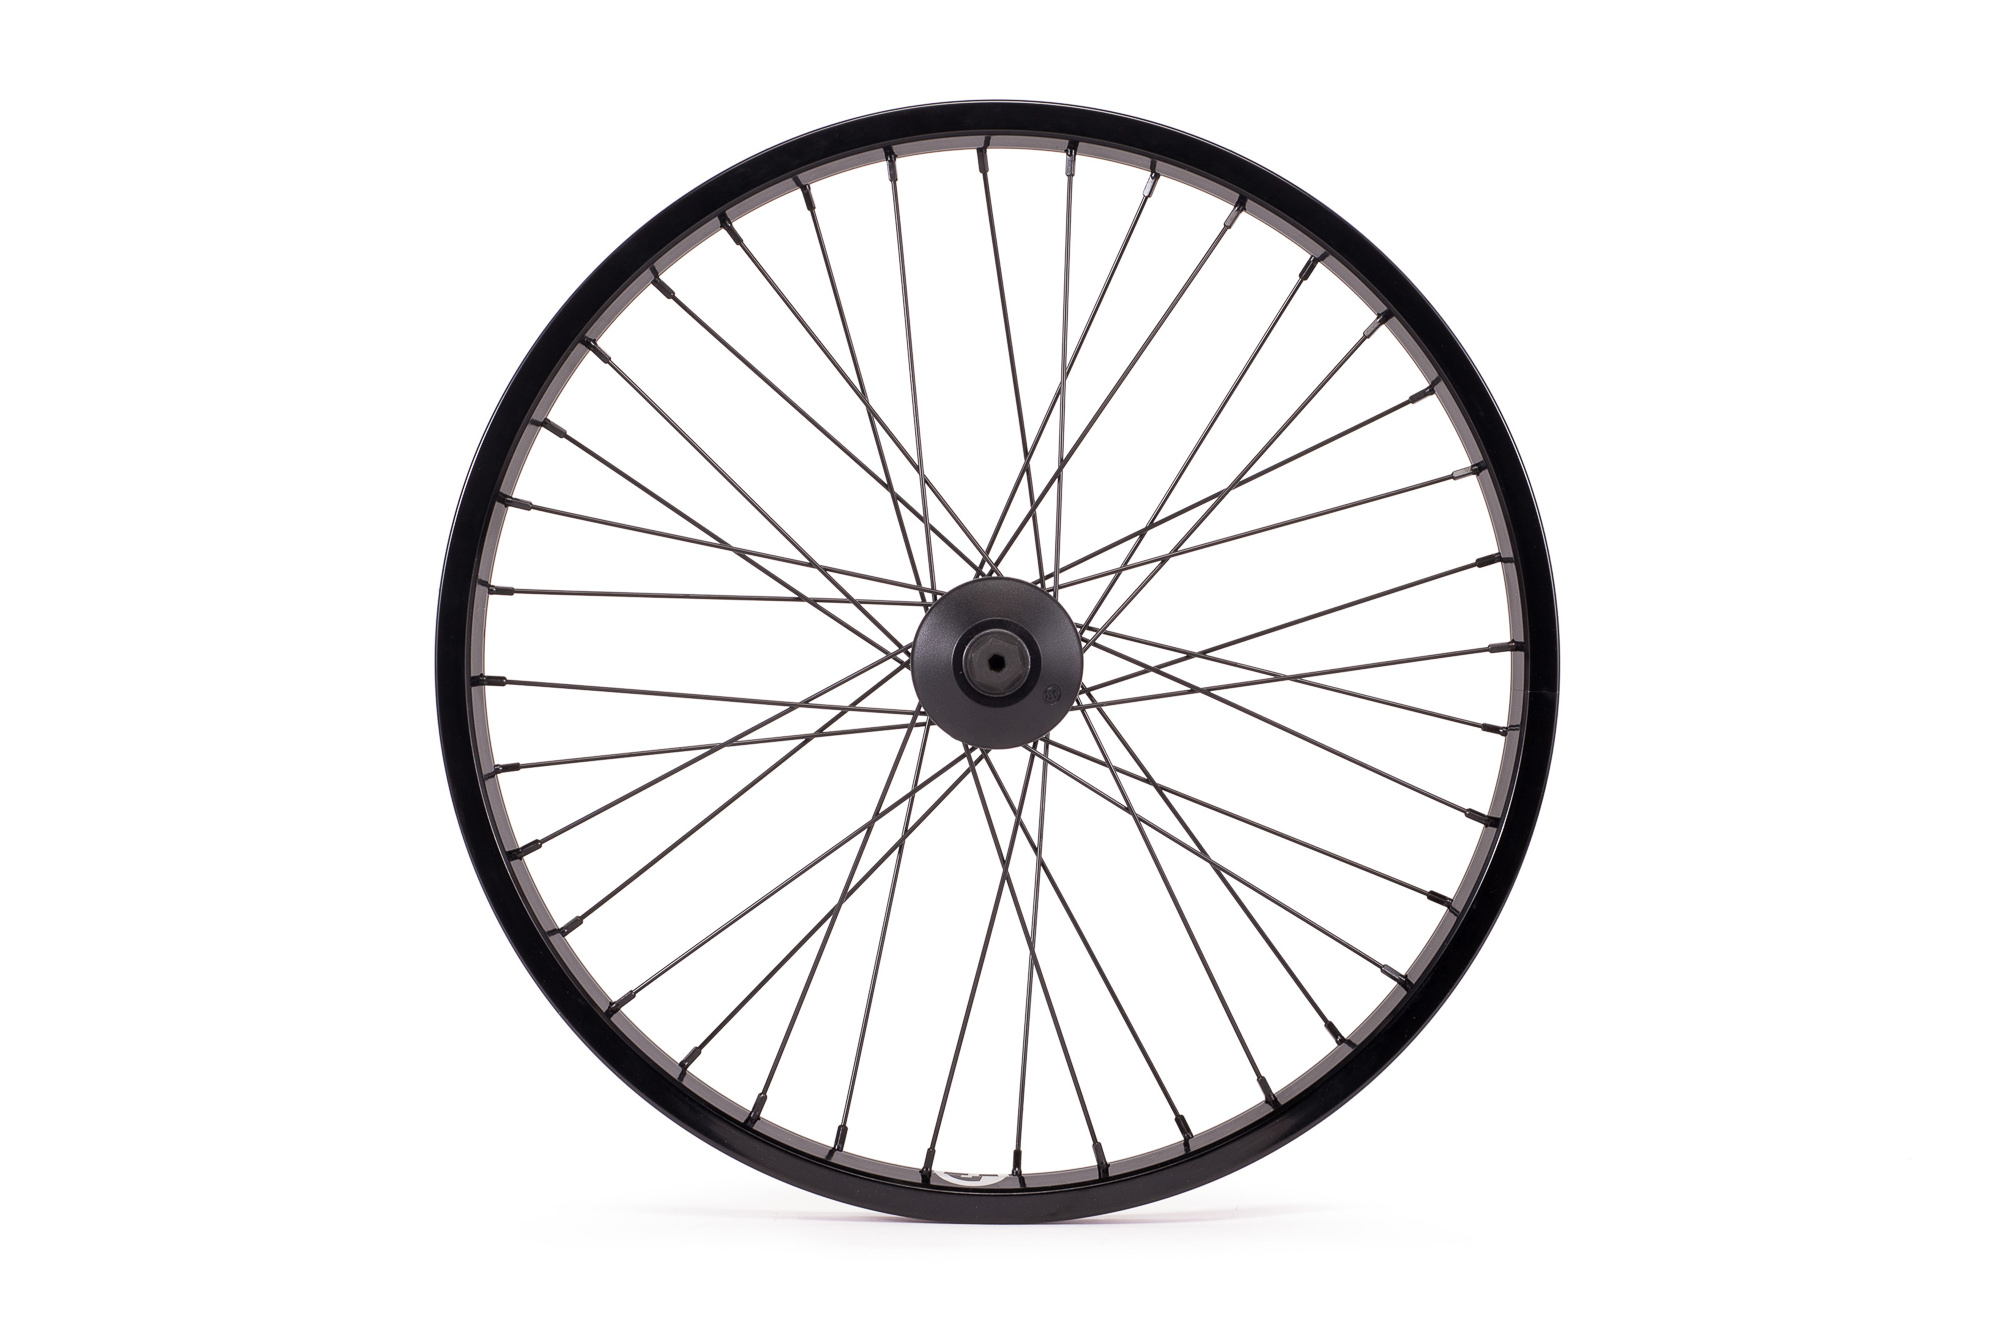 SaltPlus_Summit_20_front_wheel_02